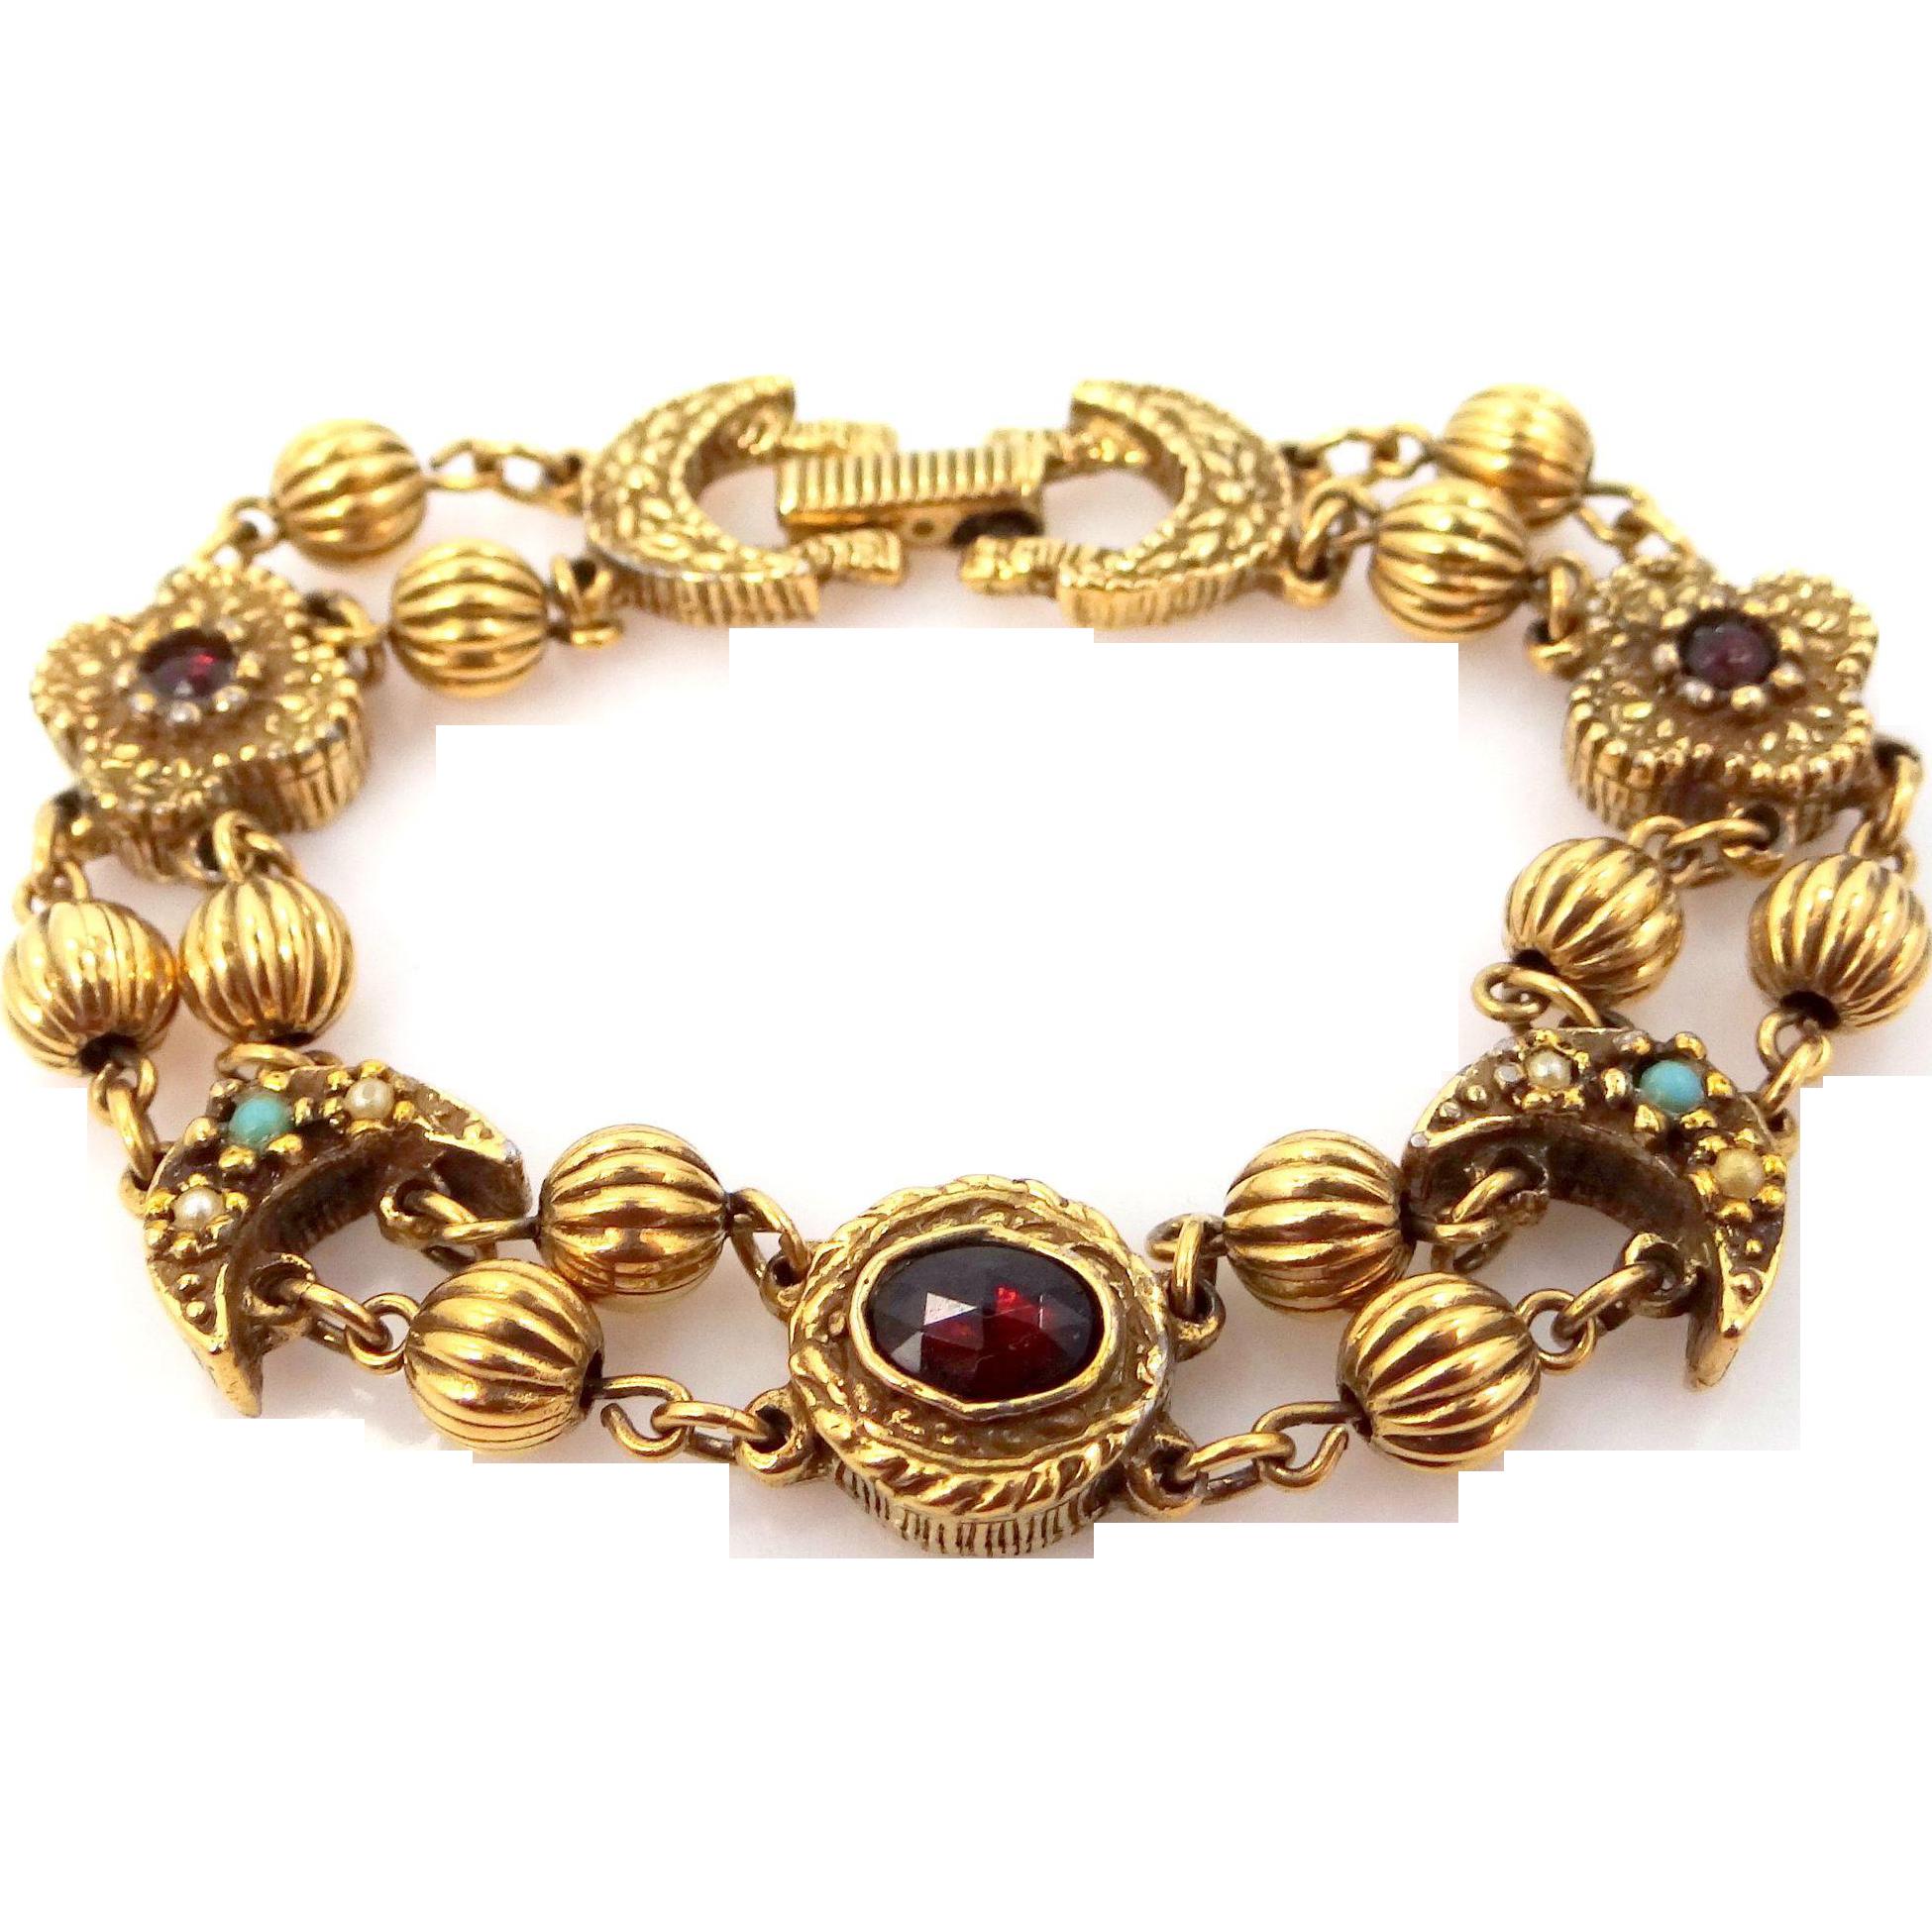 Goldette Faux Seed Pearls, Turquoise and Garnets Slides Bracelet